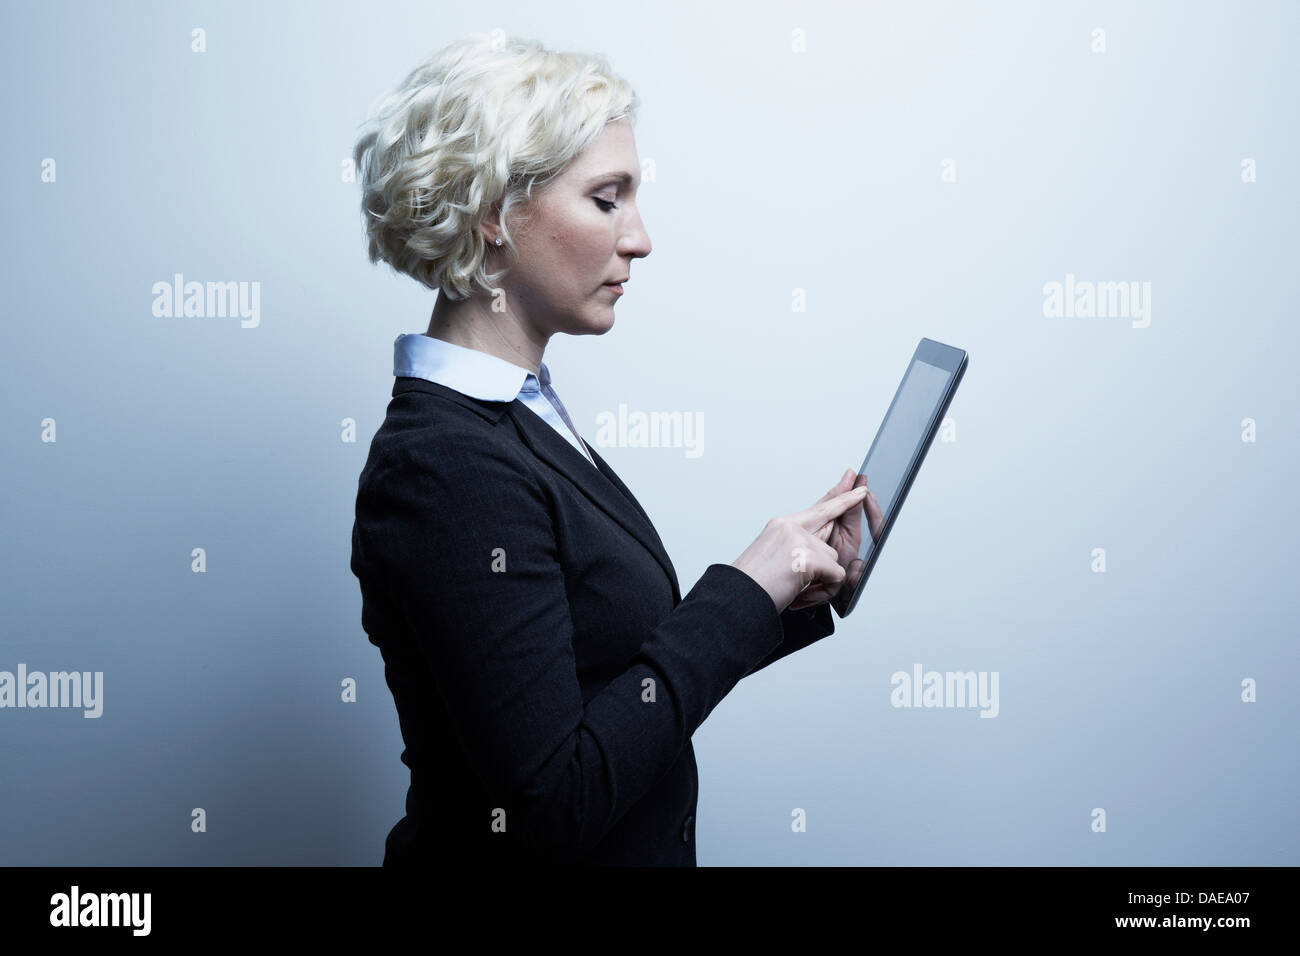 Studio portrait of blond businesswoman looking at digital tablet - Stock Image